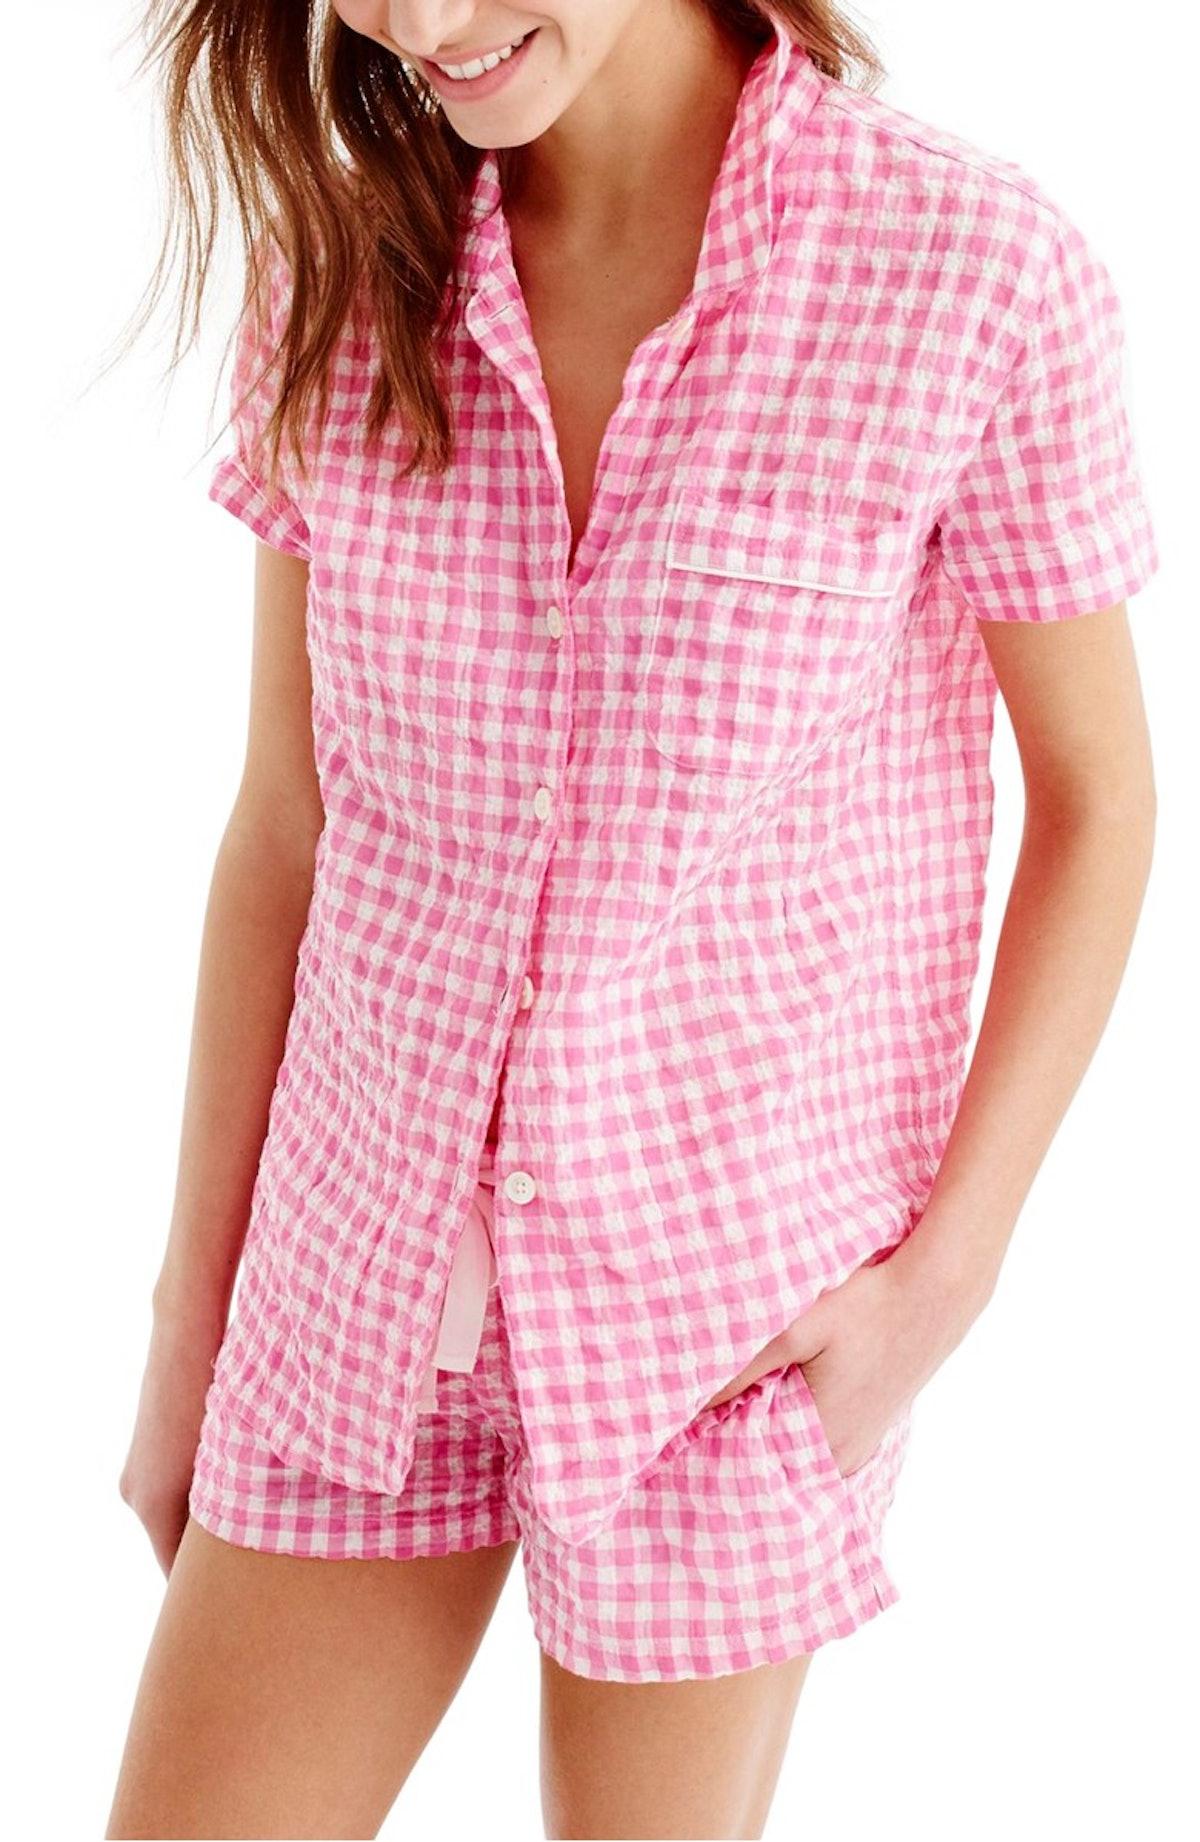 J.Crew Gingham Pajama Set